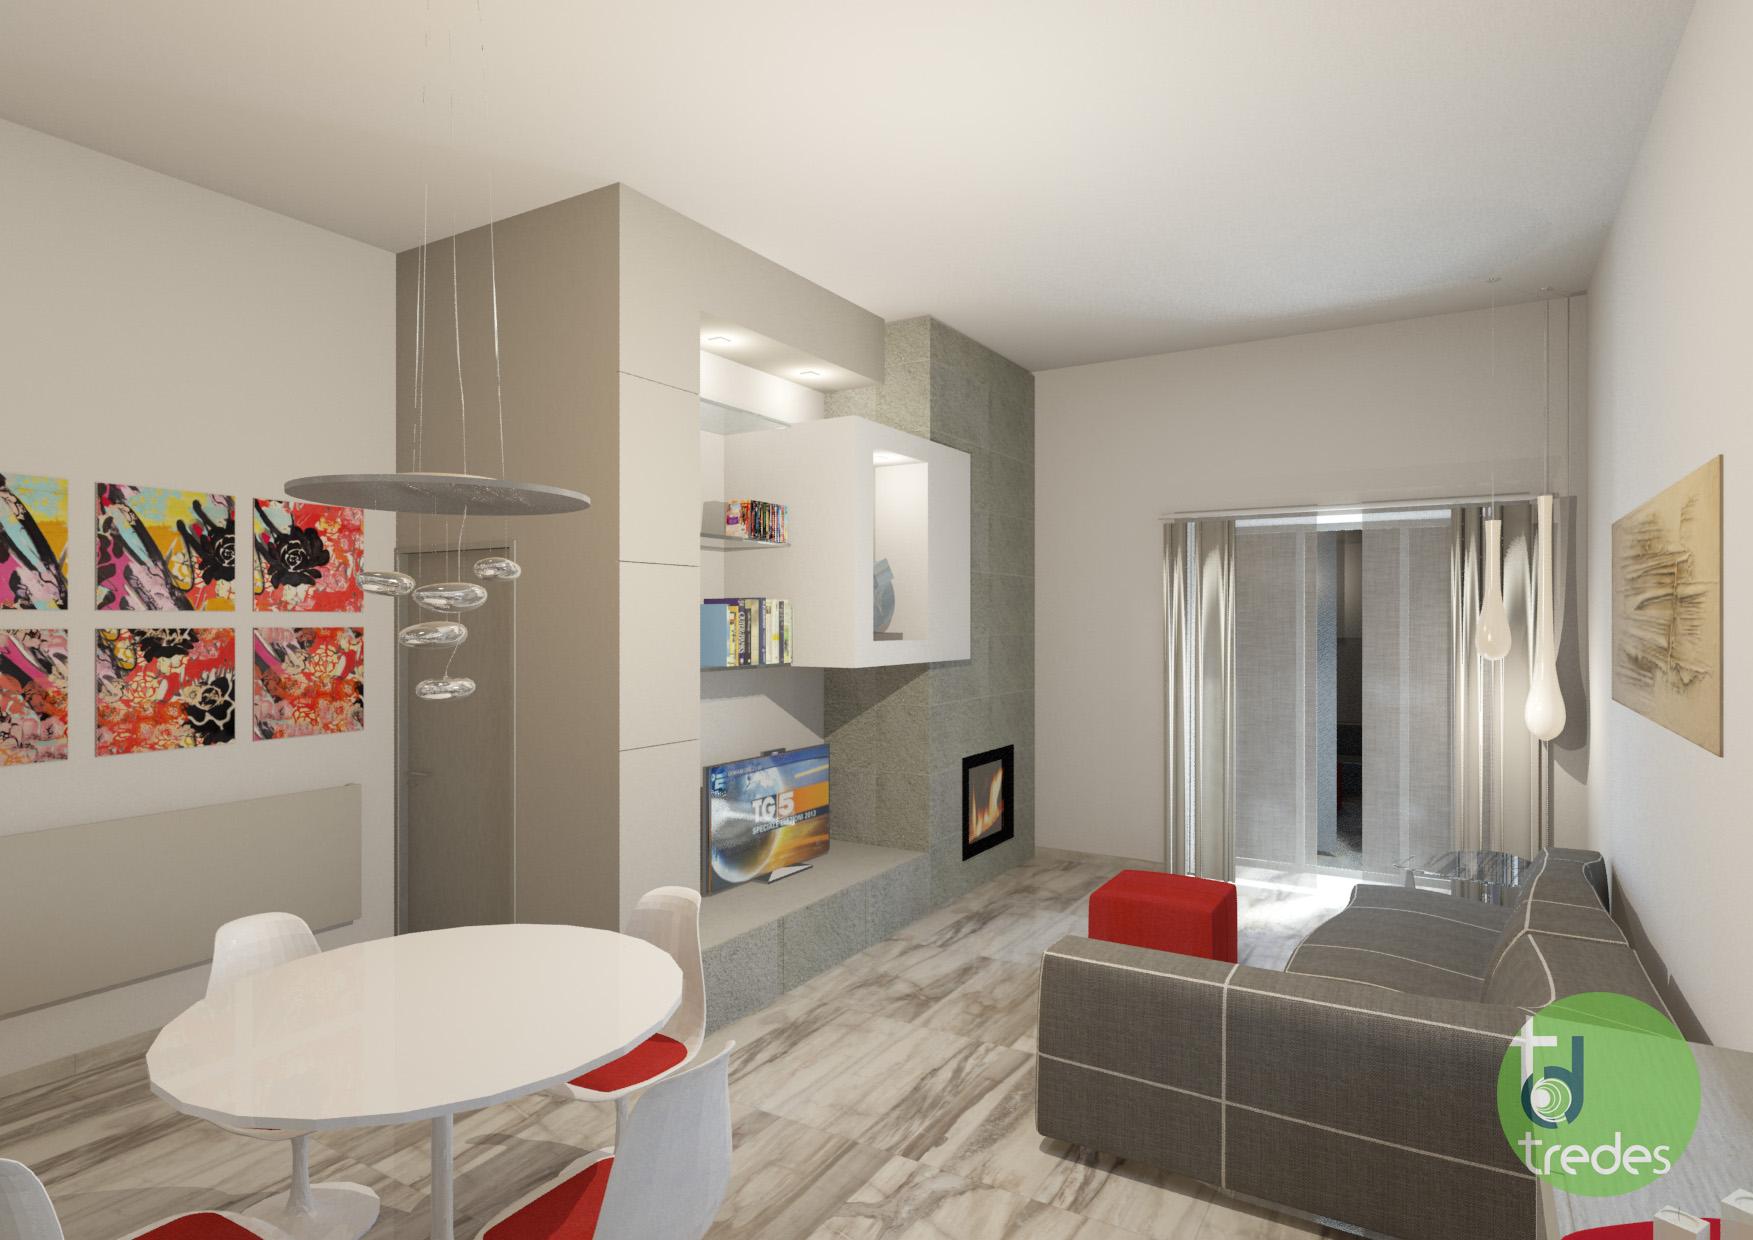 Progetto 3d casa moderna tredes - Progetto casa moderna ...